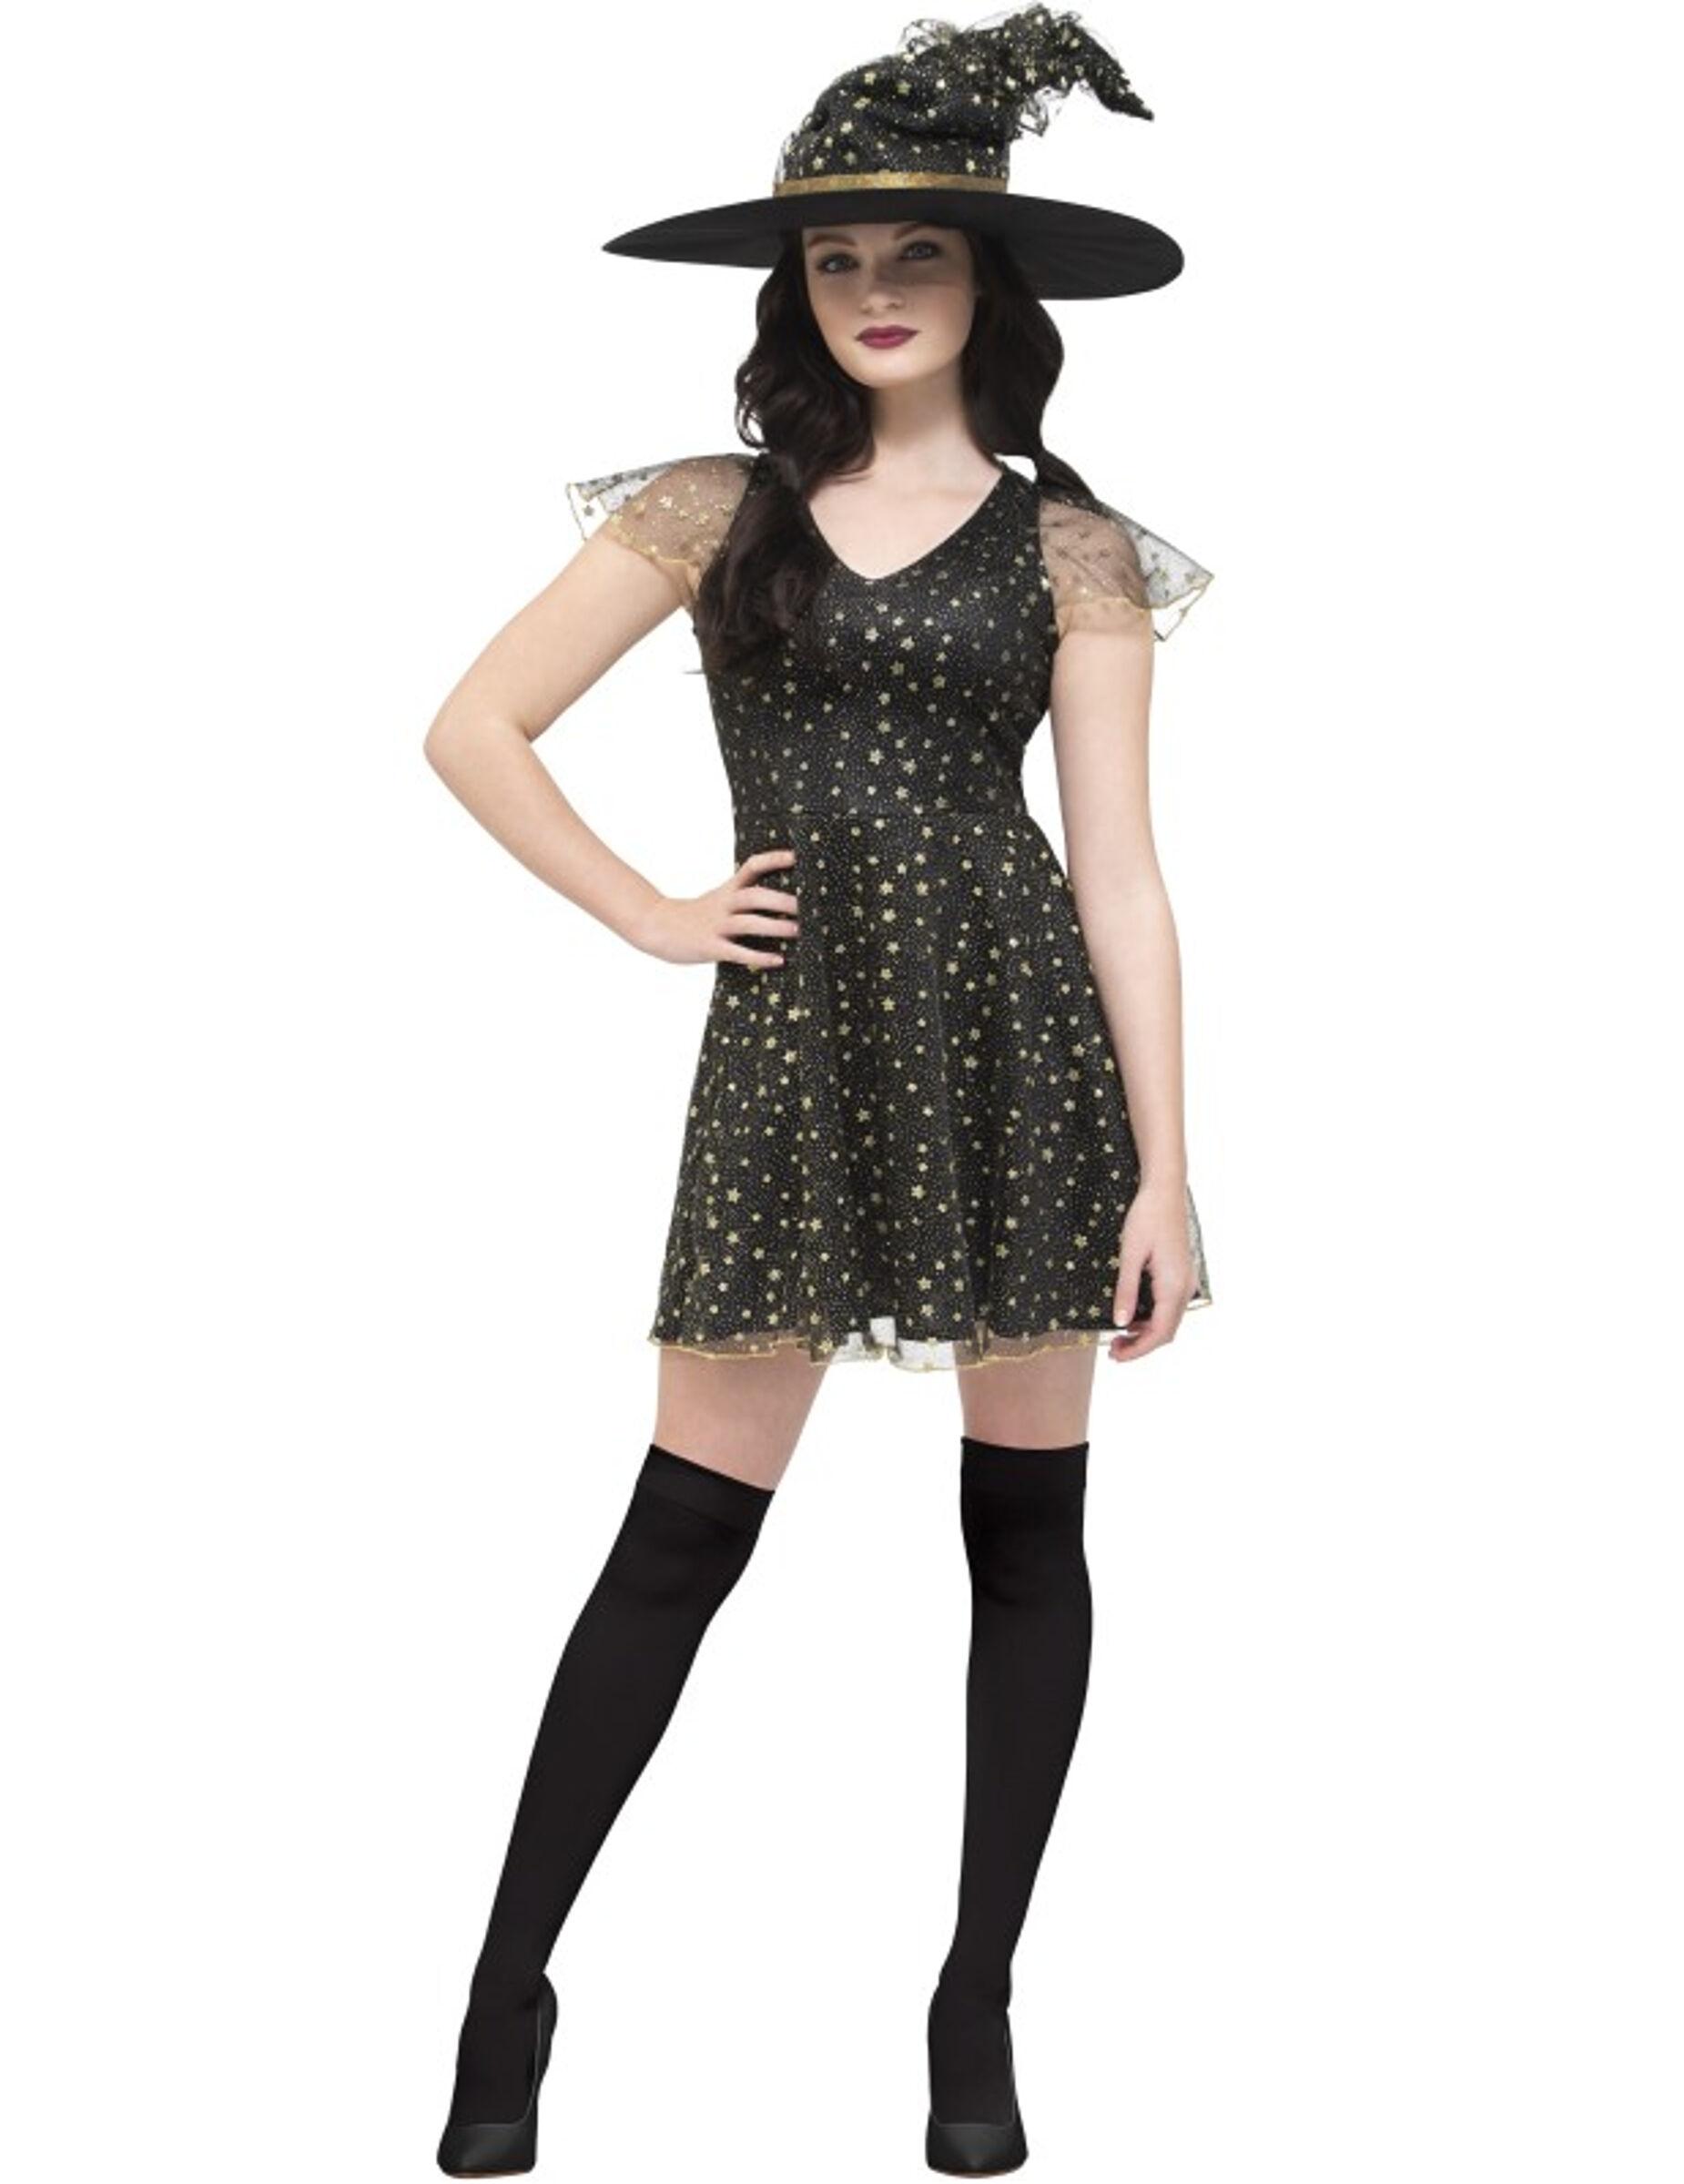 Vegaoo Costume strega delle stelle dorate donna halloween - M